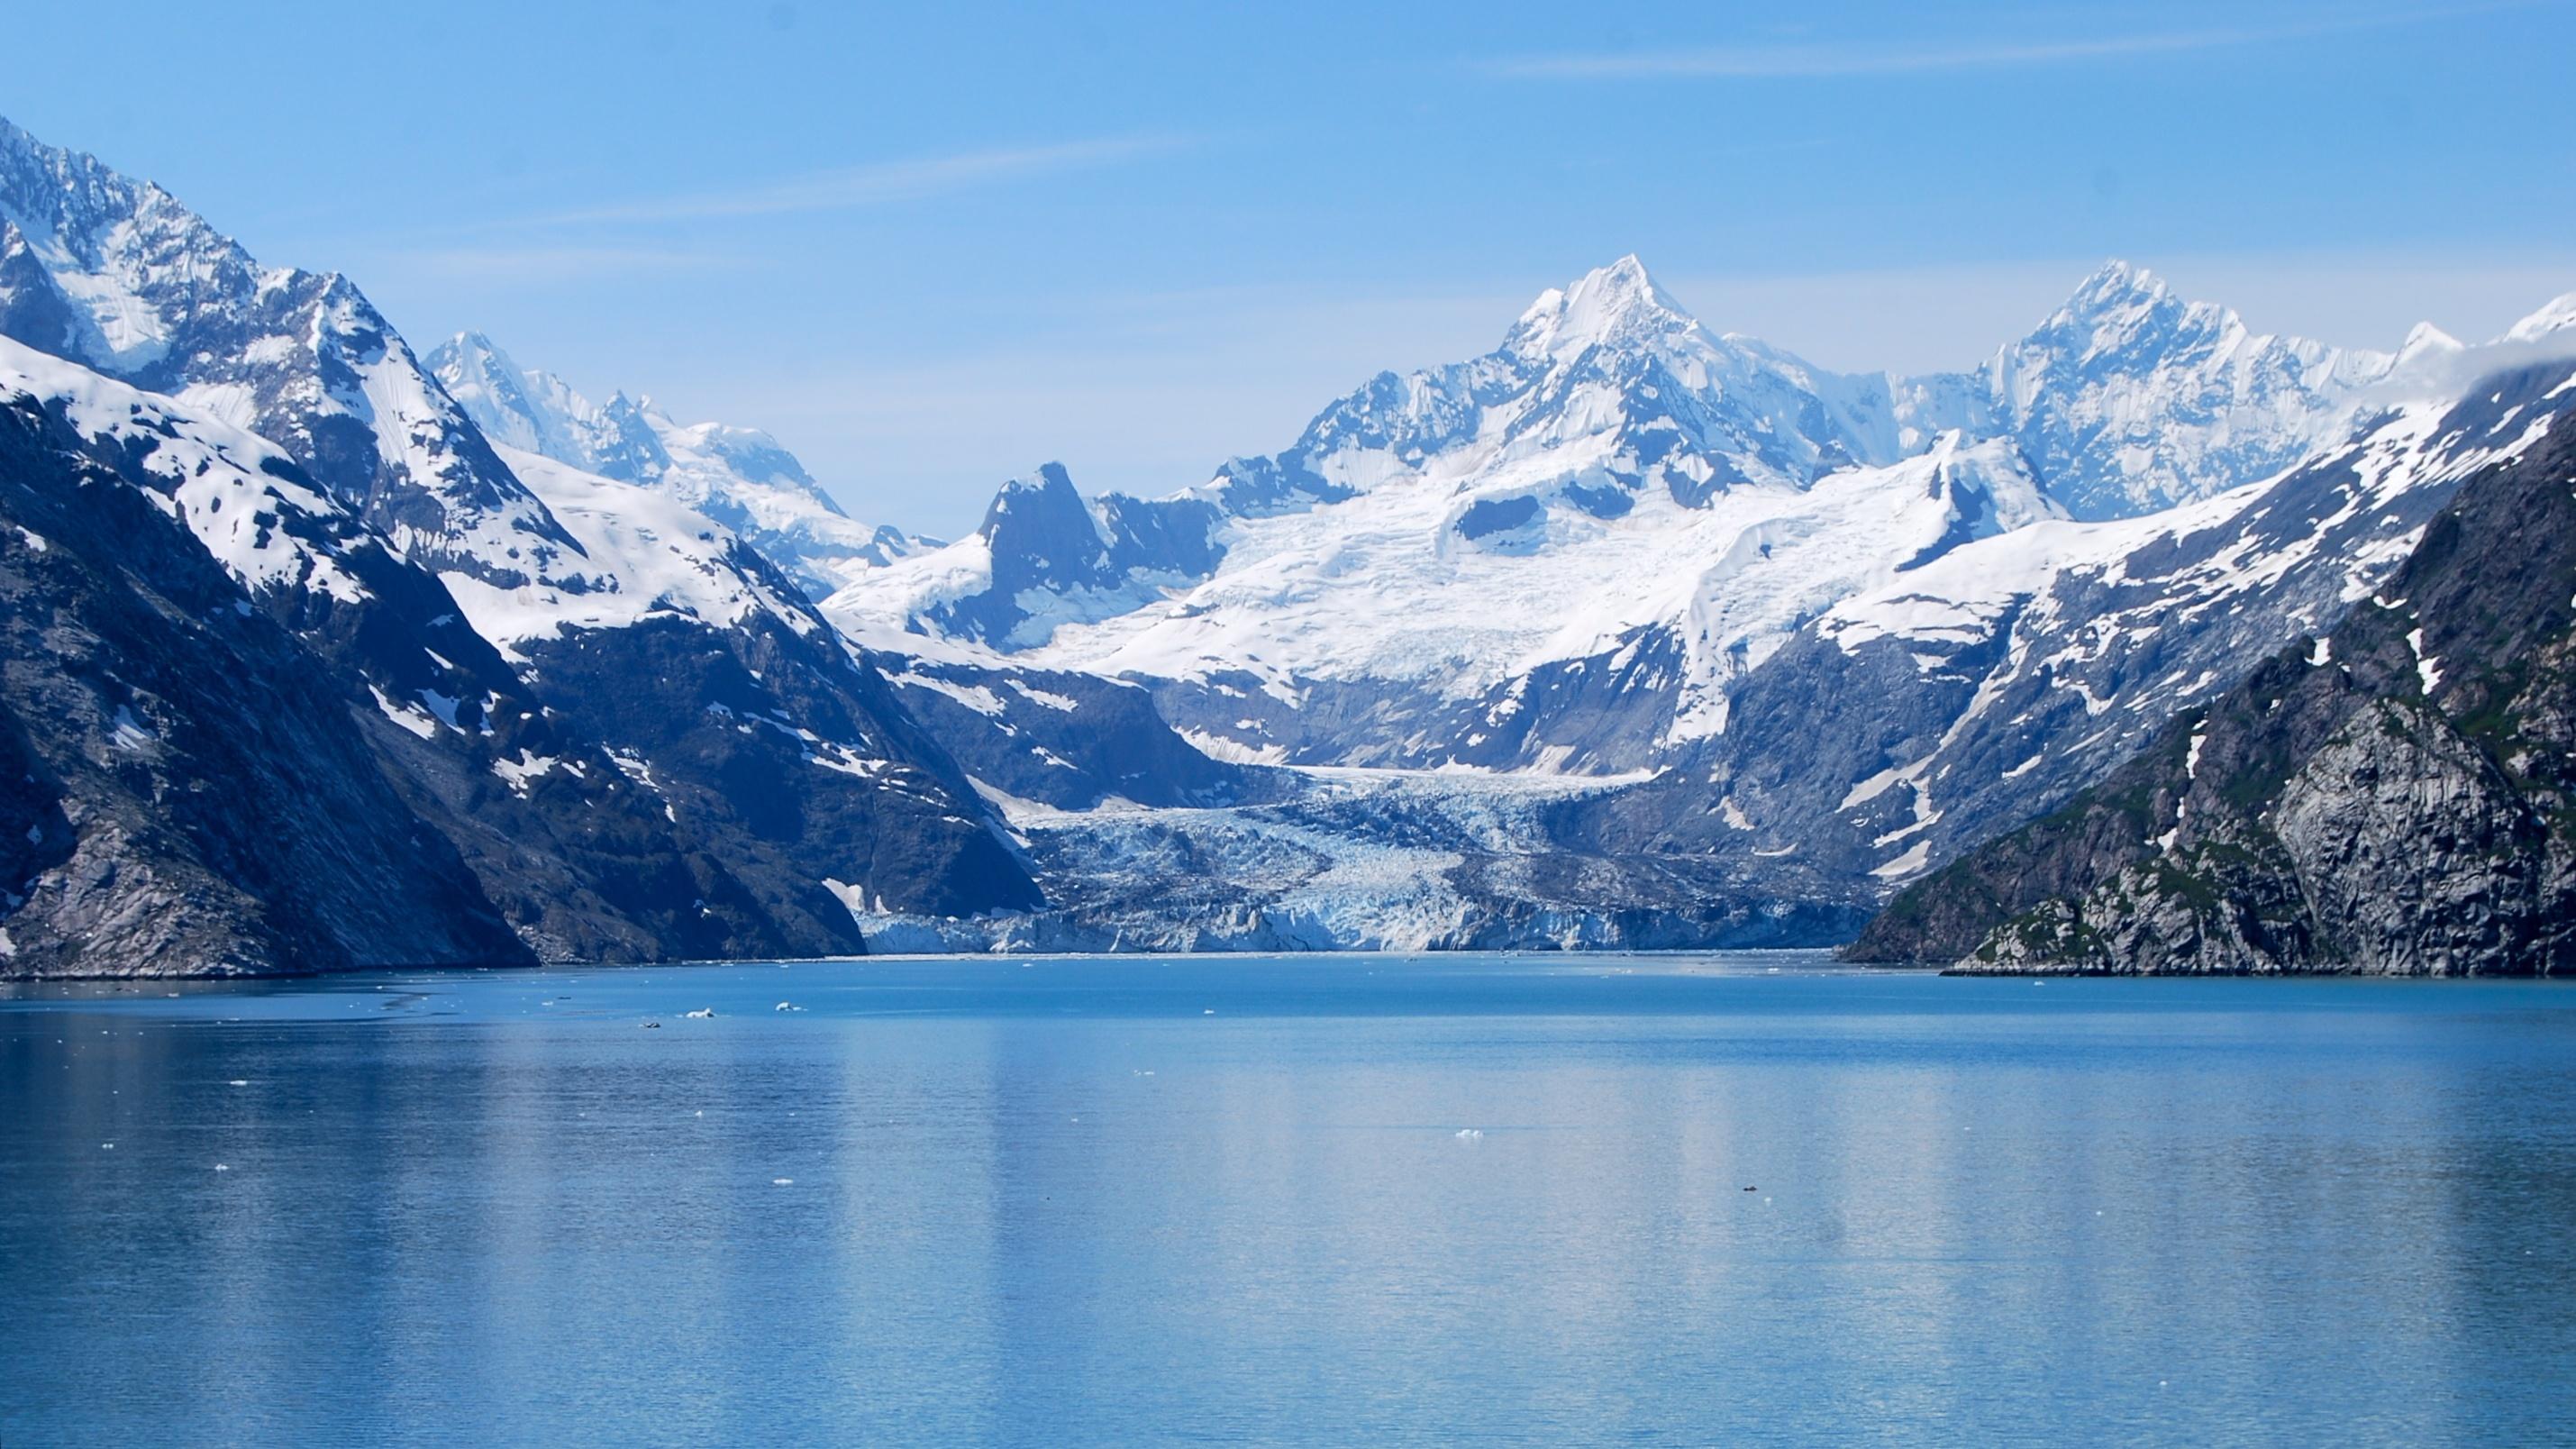 High Resolution Wallpaper | Glacier 2859x1608 px